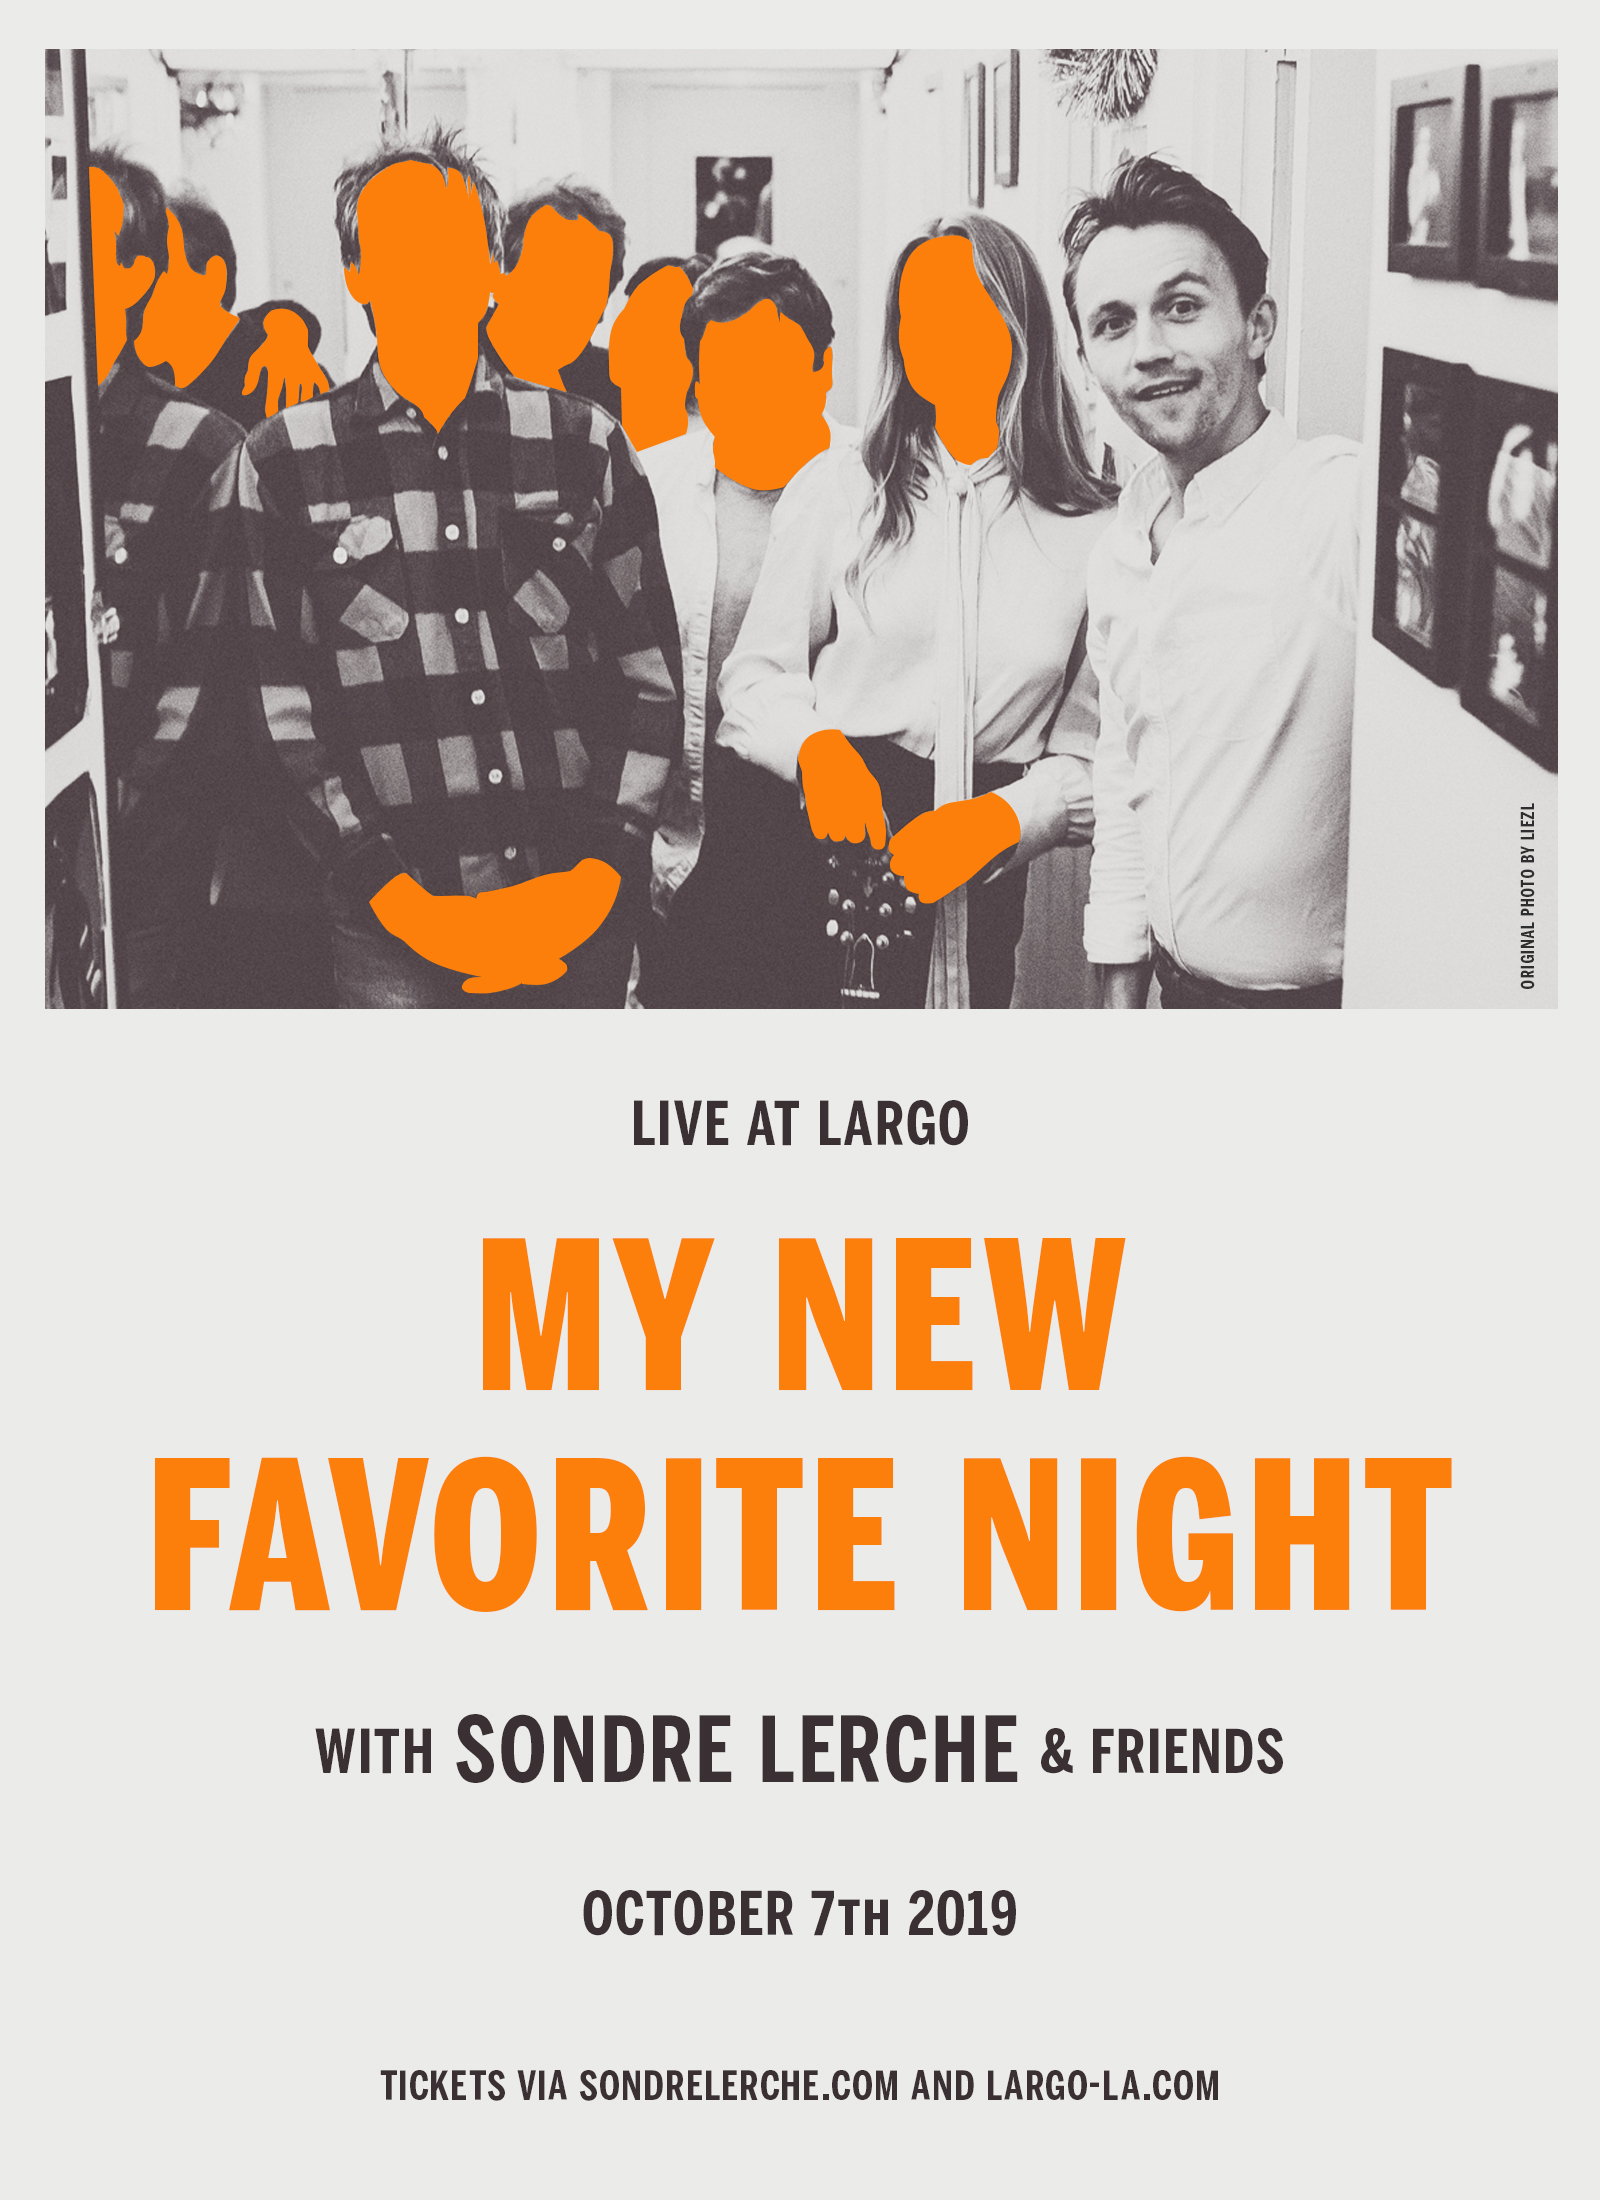 My New Favorite Night with Sondre Lerche & Friends